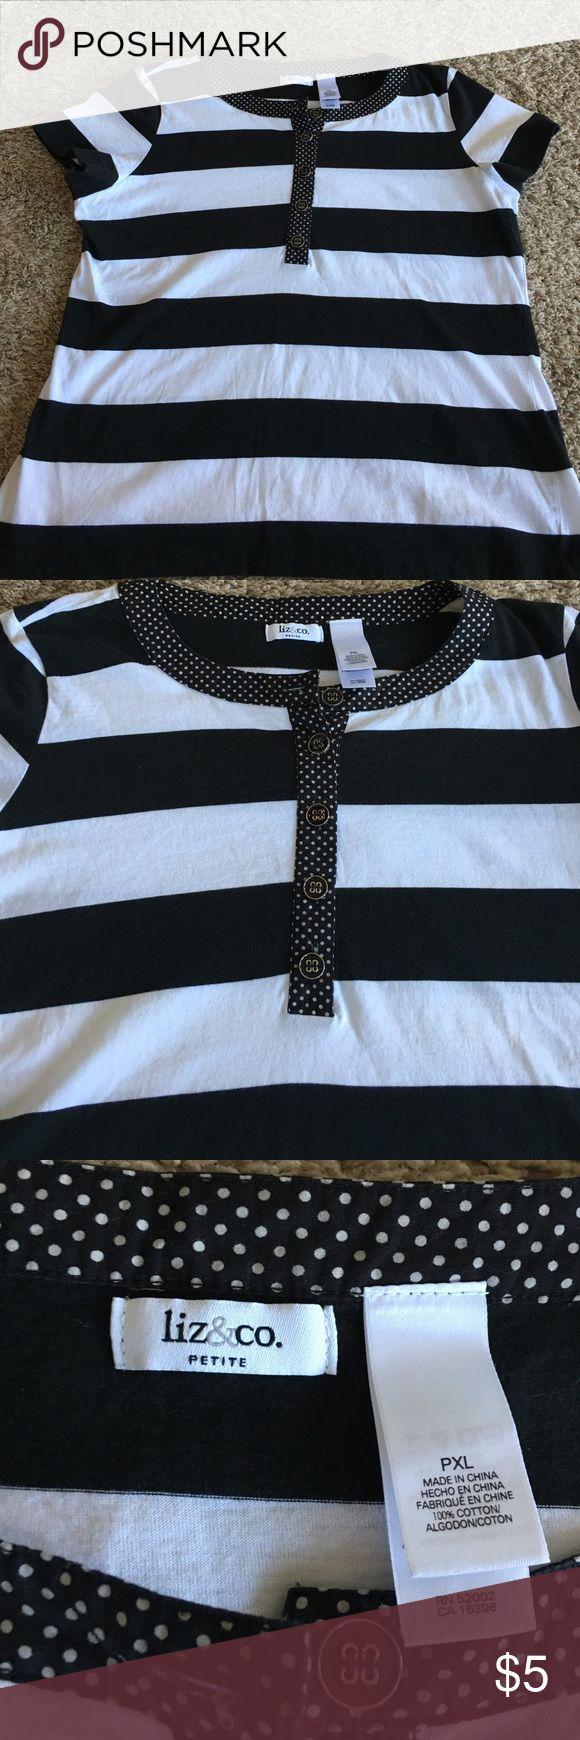 Women's Tee Black and white striped tee. Polka dot trim on collar. Button half way up liz&co. Tops